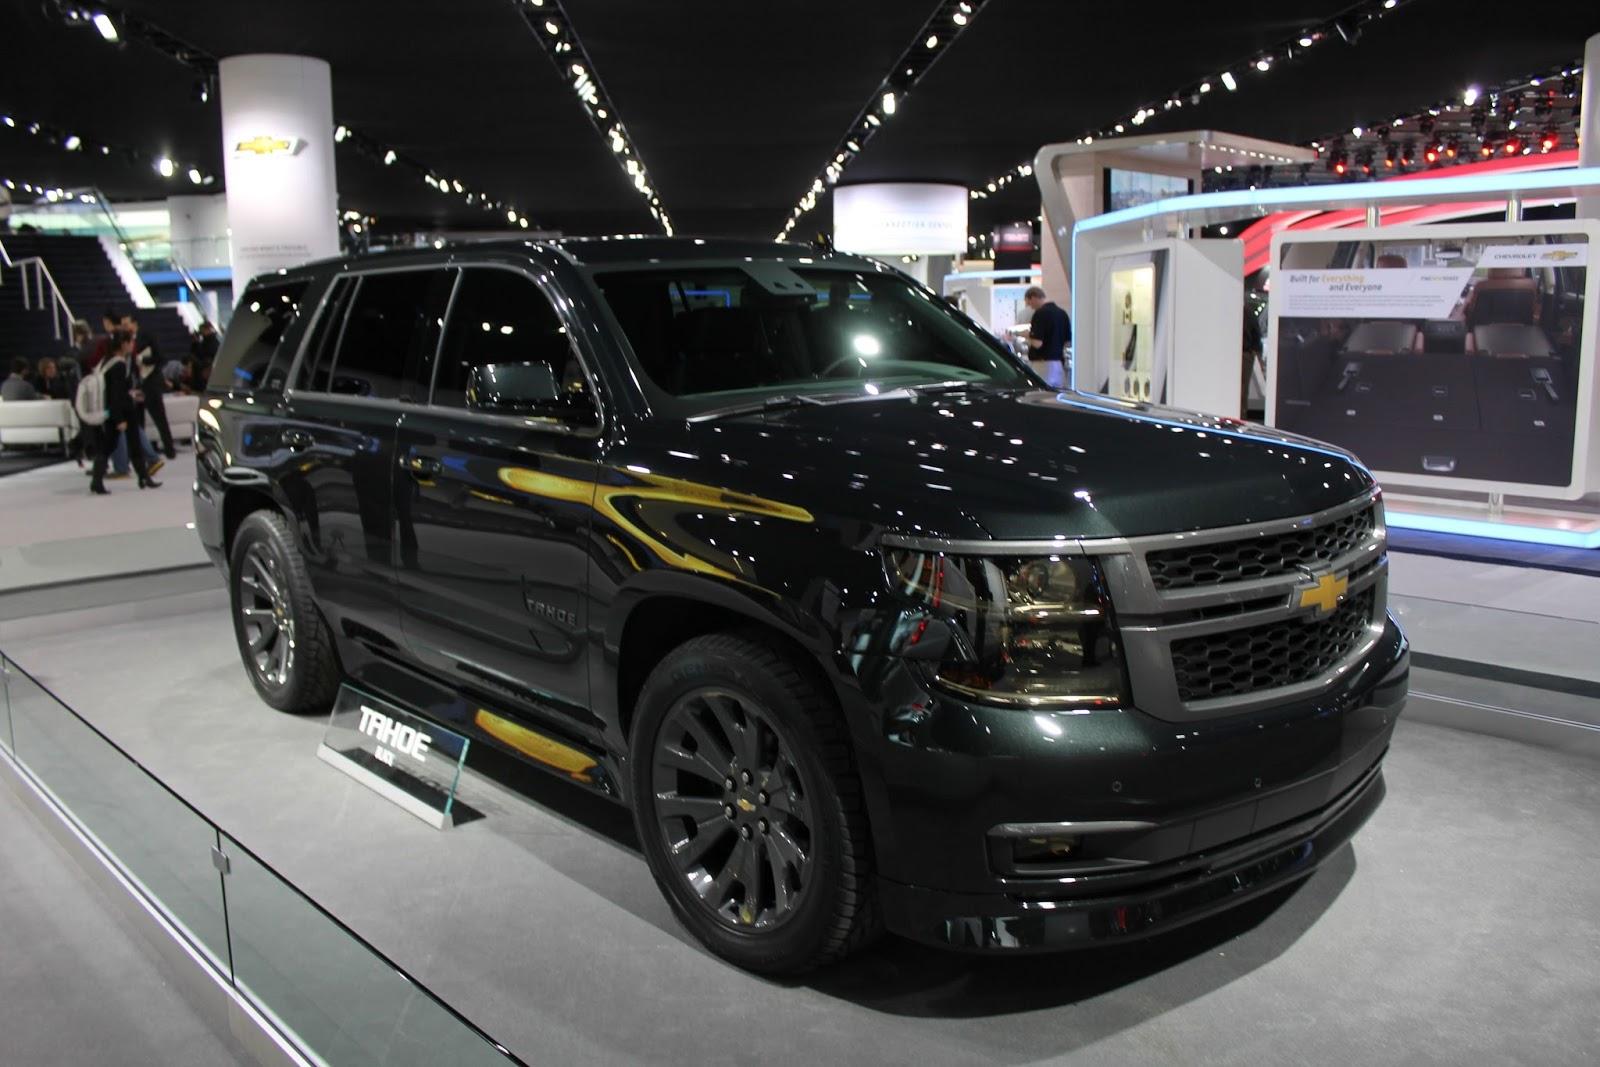 2016 Chevy Trailblazer Interior